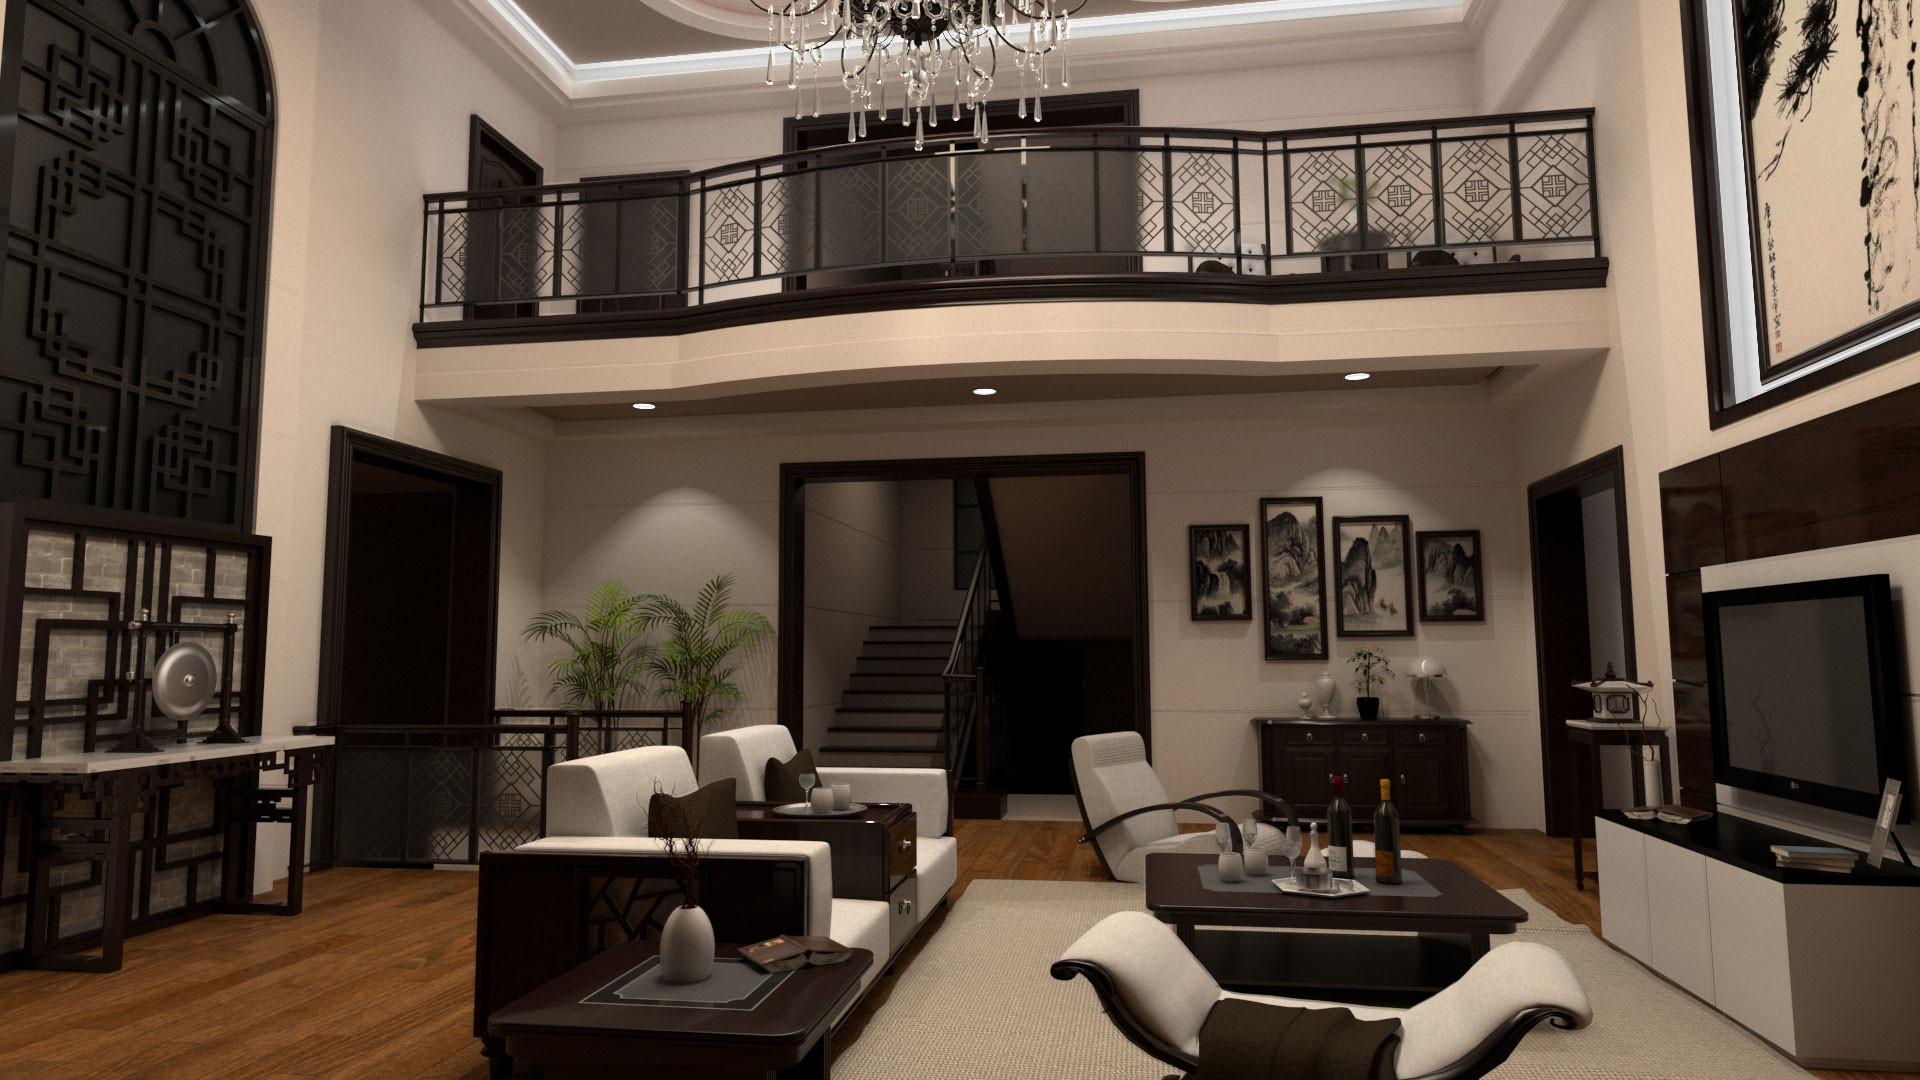 Modern Chinese Interior Design, Joey Lee